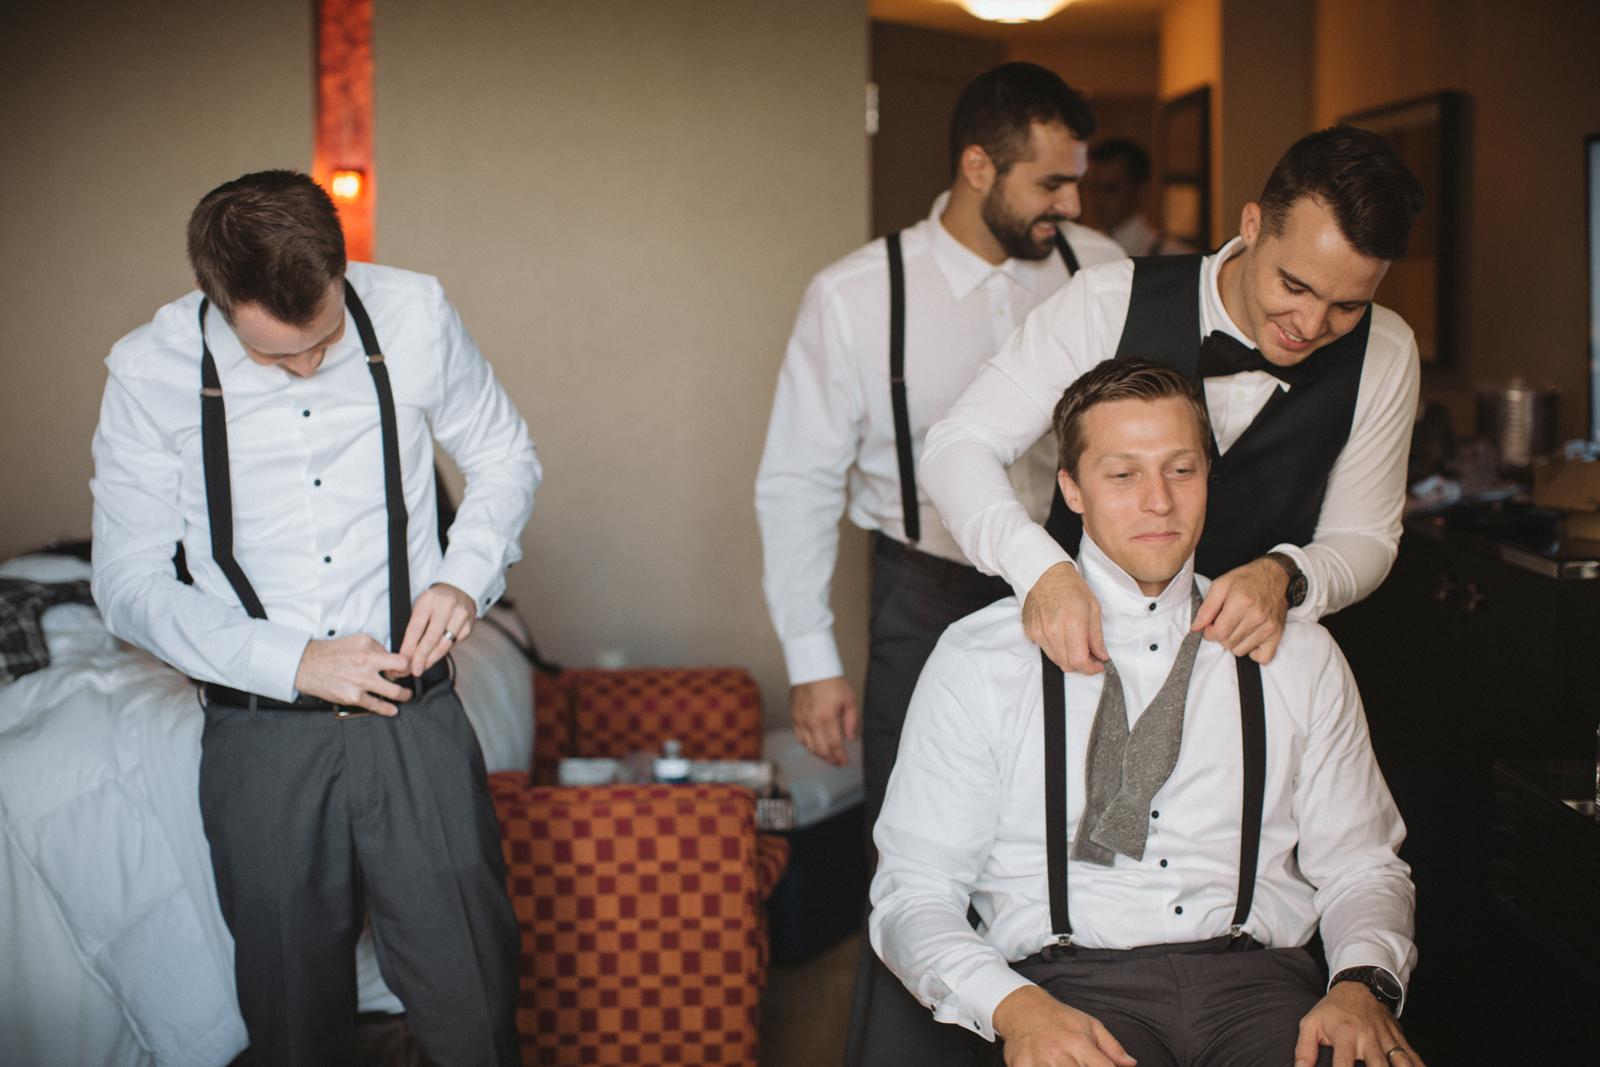 BeanandCole.com-Chris&JackieJohnson-Wedding-9.jpg